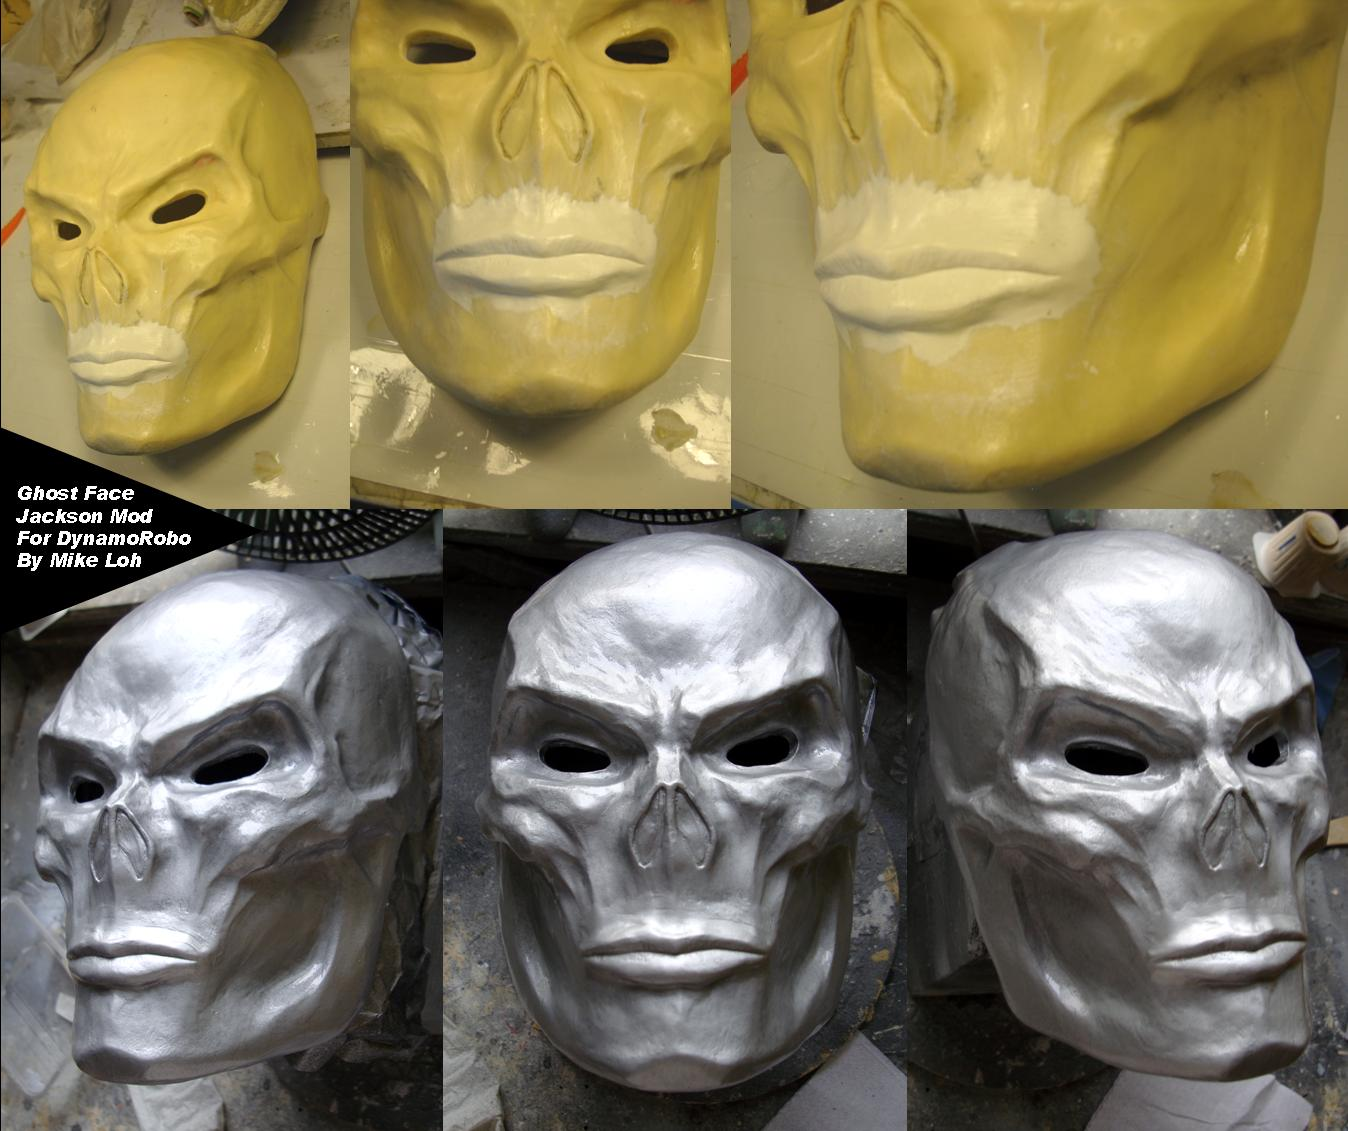 Ghostface jackson wip by uratz studios on deviantart - Uratz studios ...